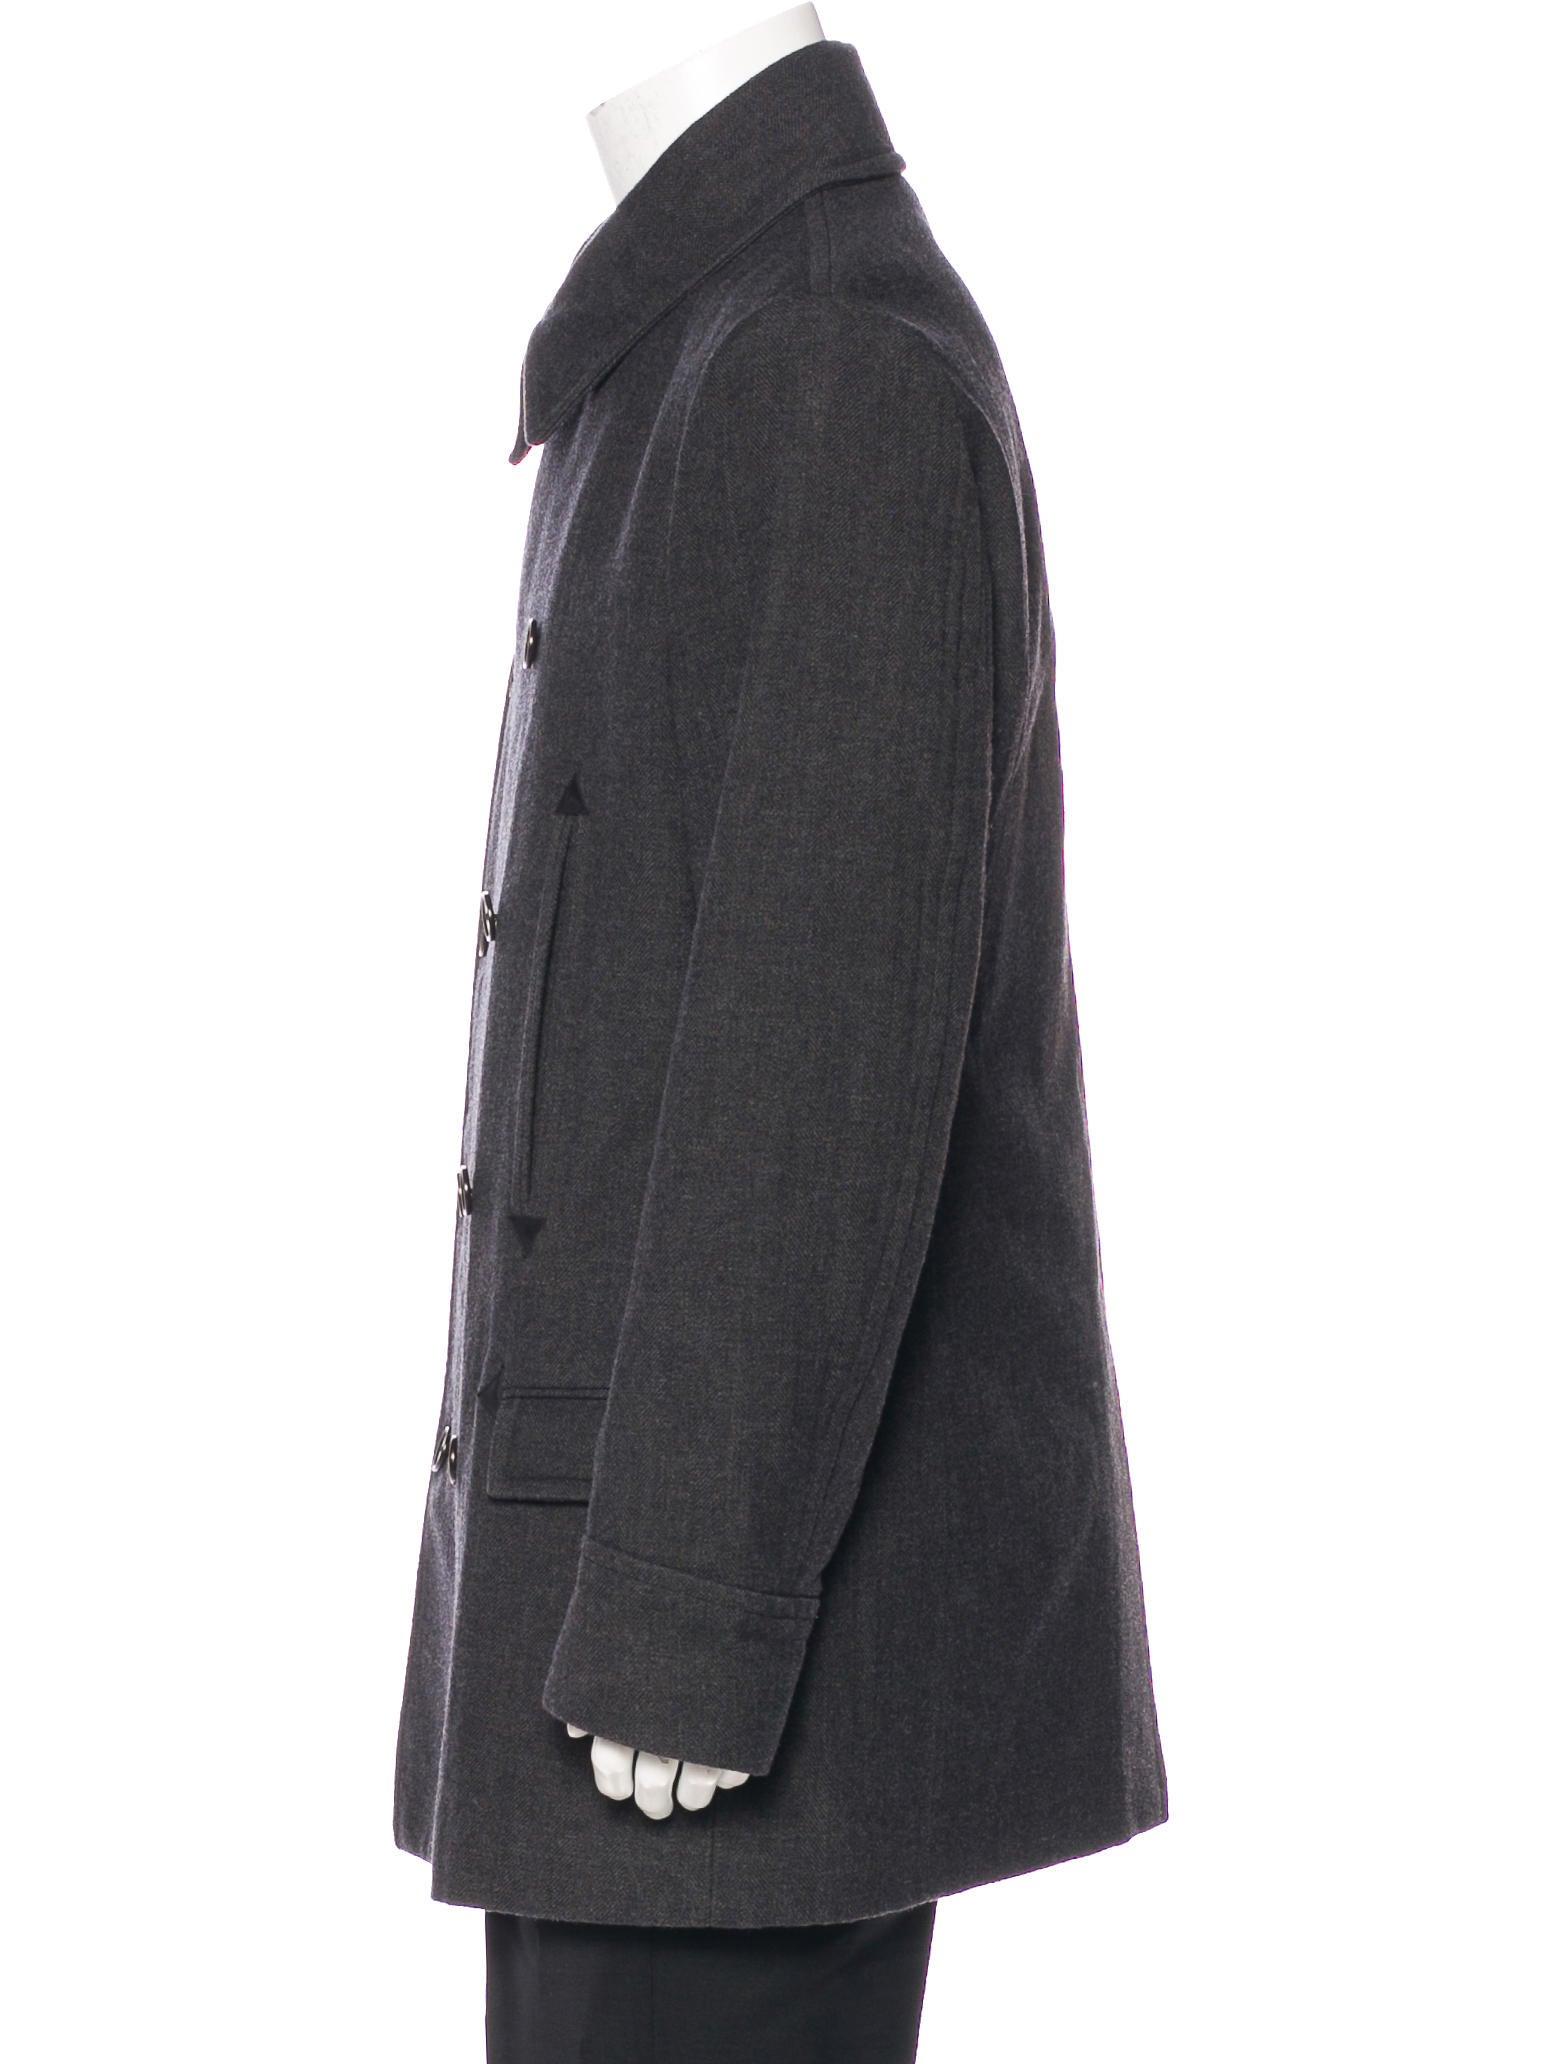 Maison Margiela Replica Double Breasted Peacoat Clothing